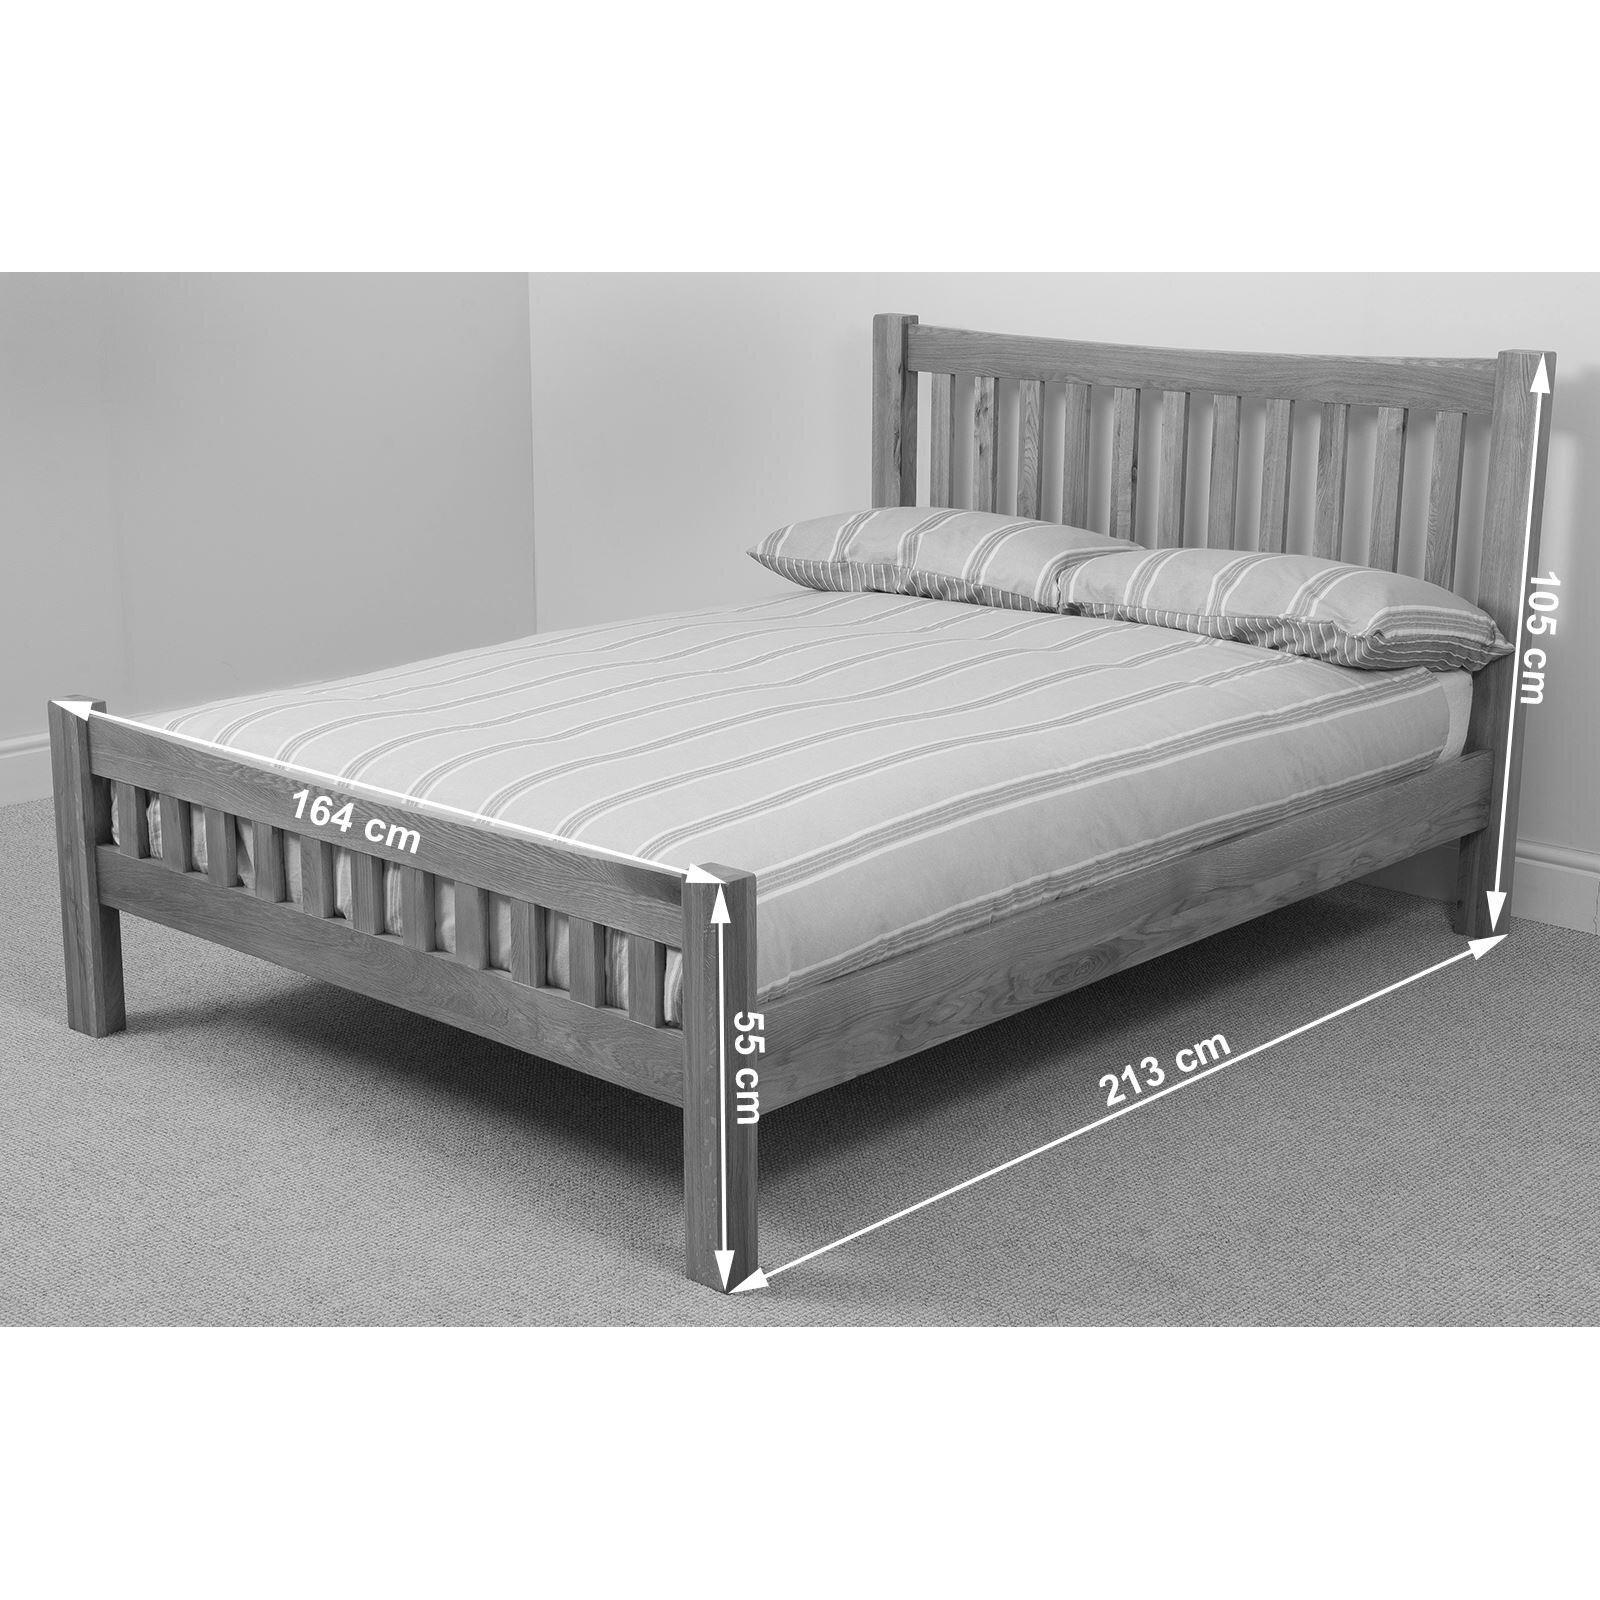 Hokku Designs Hokku Designs Bed Frame Wayfaircouk